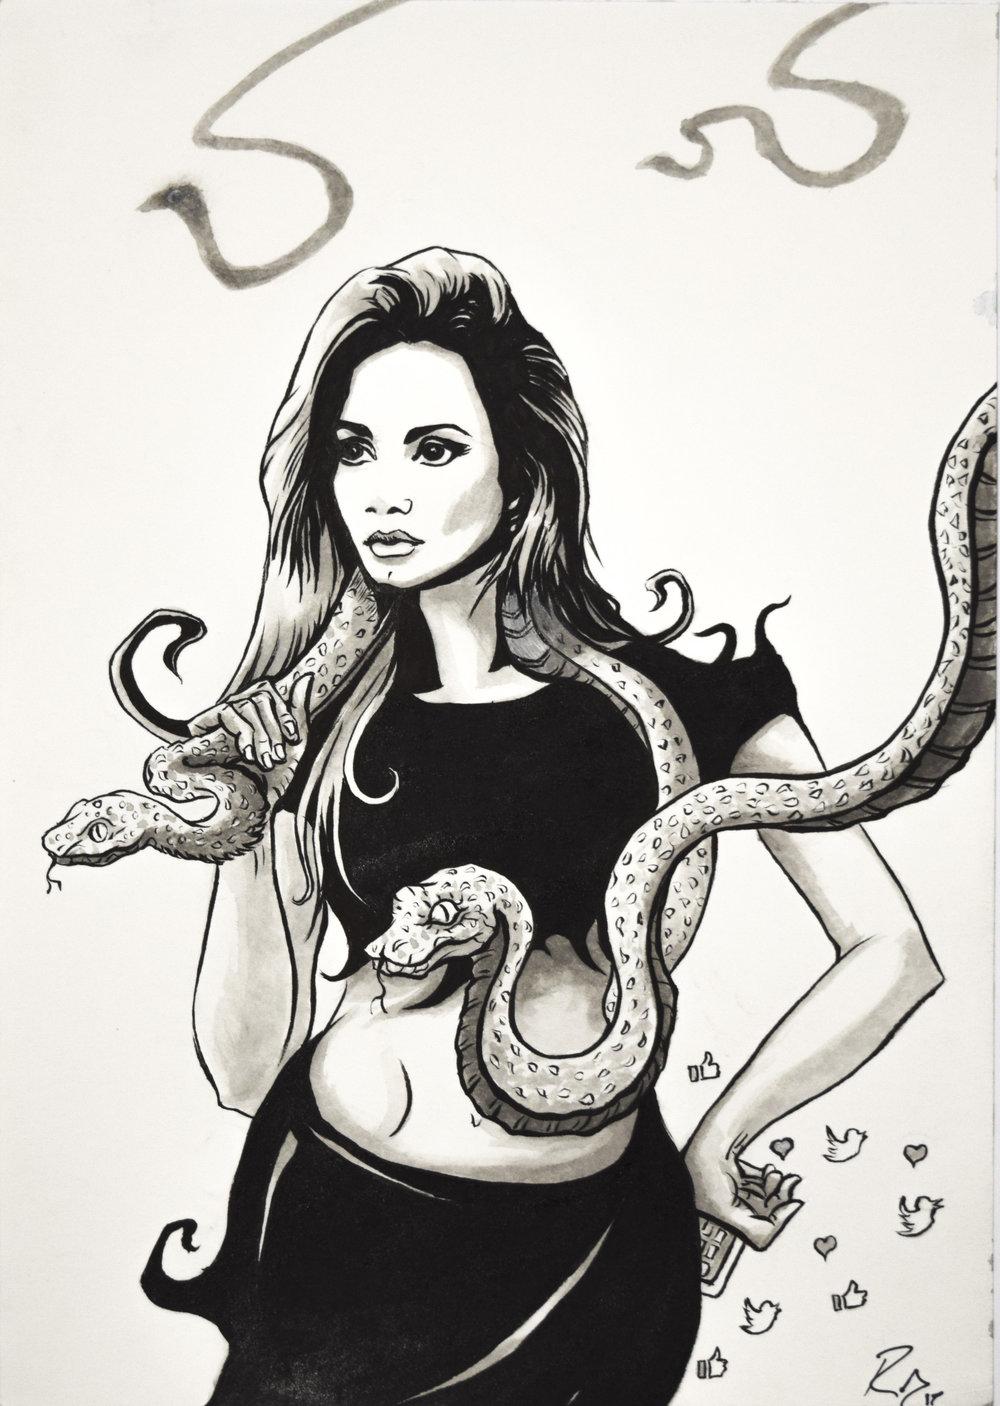 'Gatherer of Snakes'